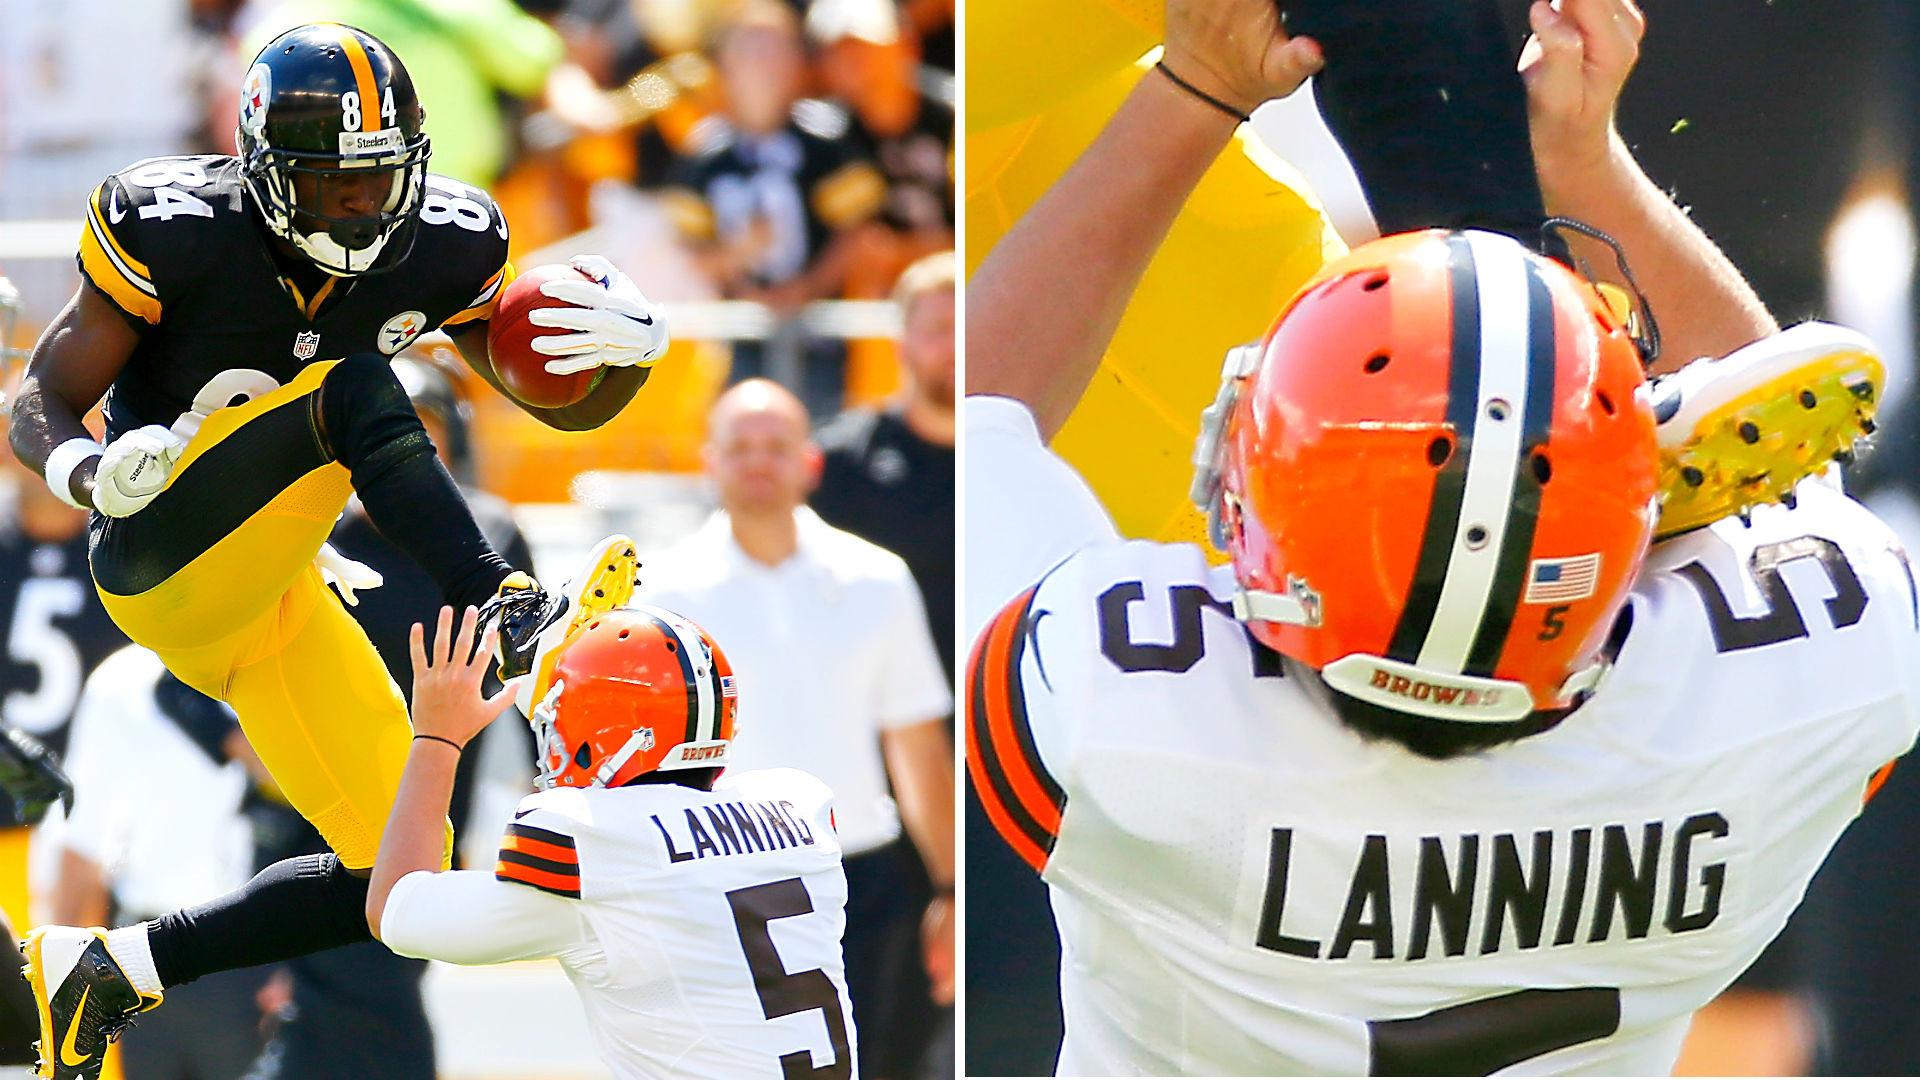 Antonio Brown karate kicks Browns punter in the face | NFL | Sporting News